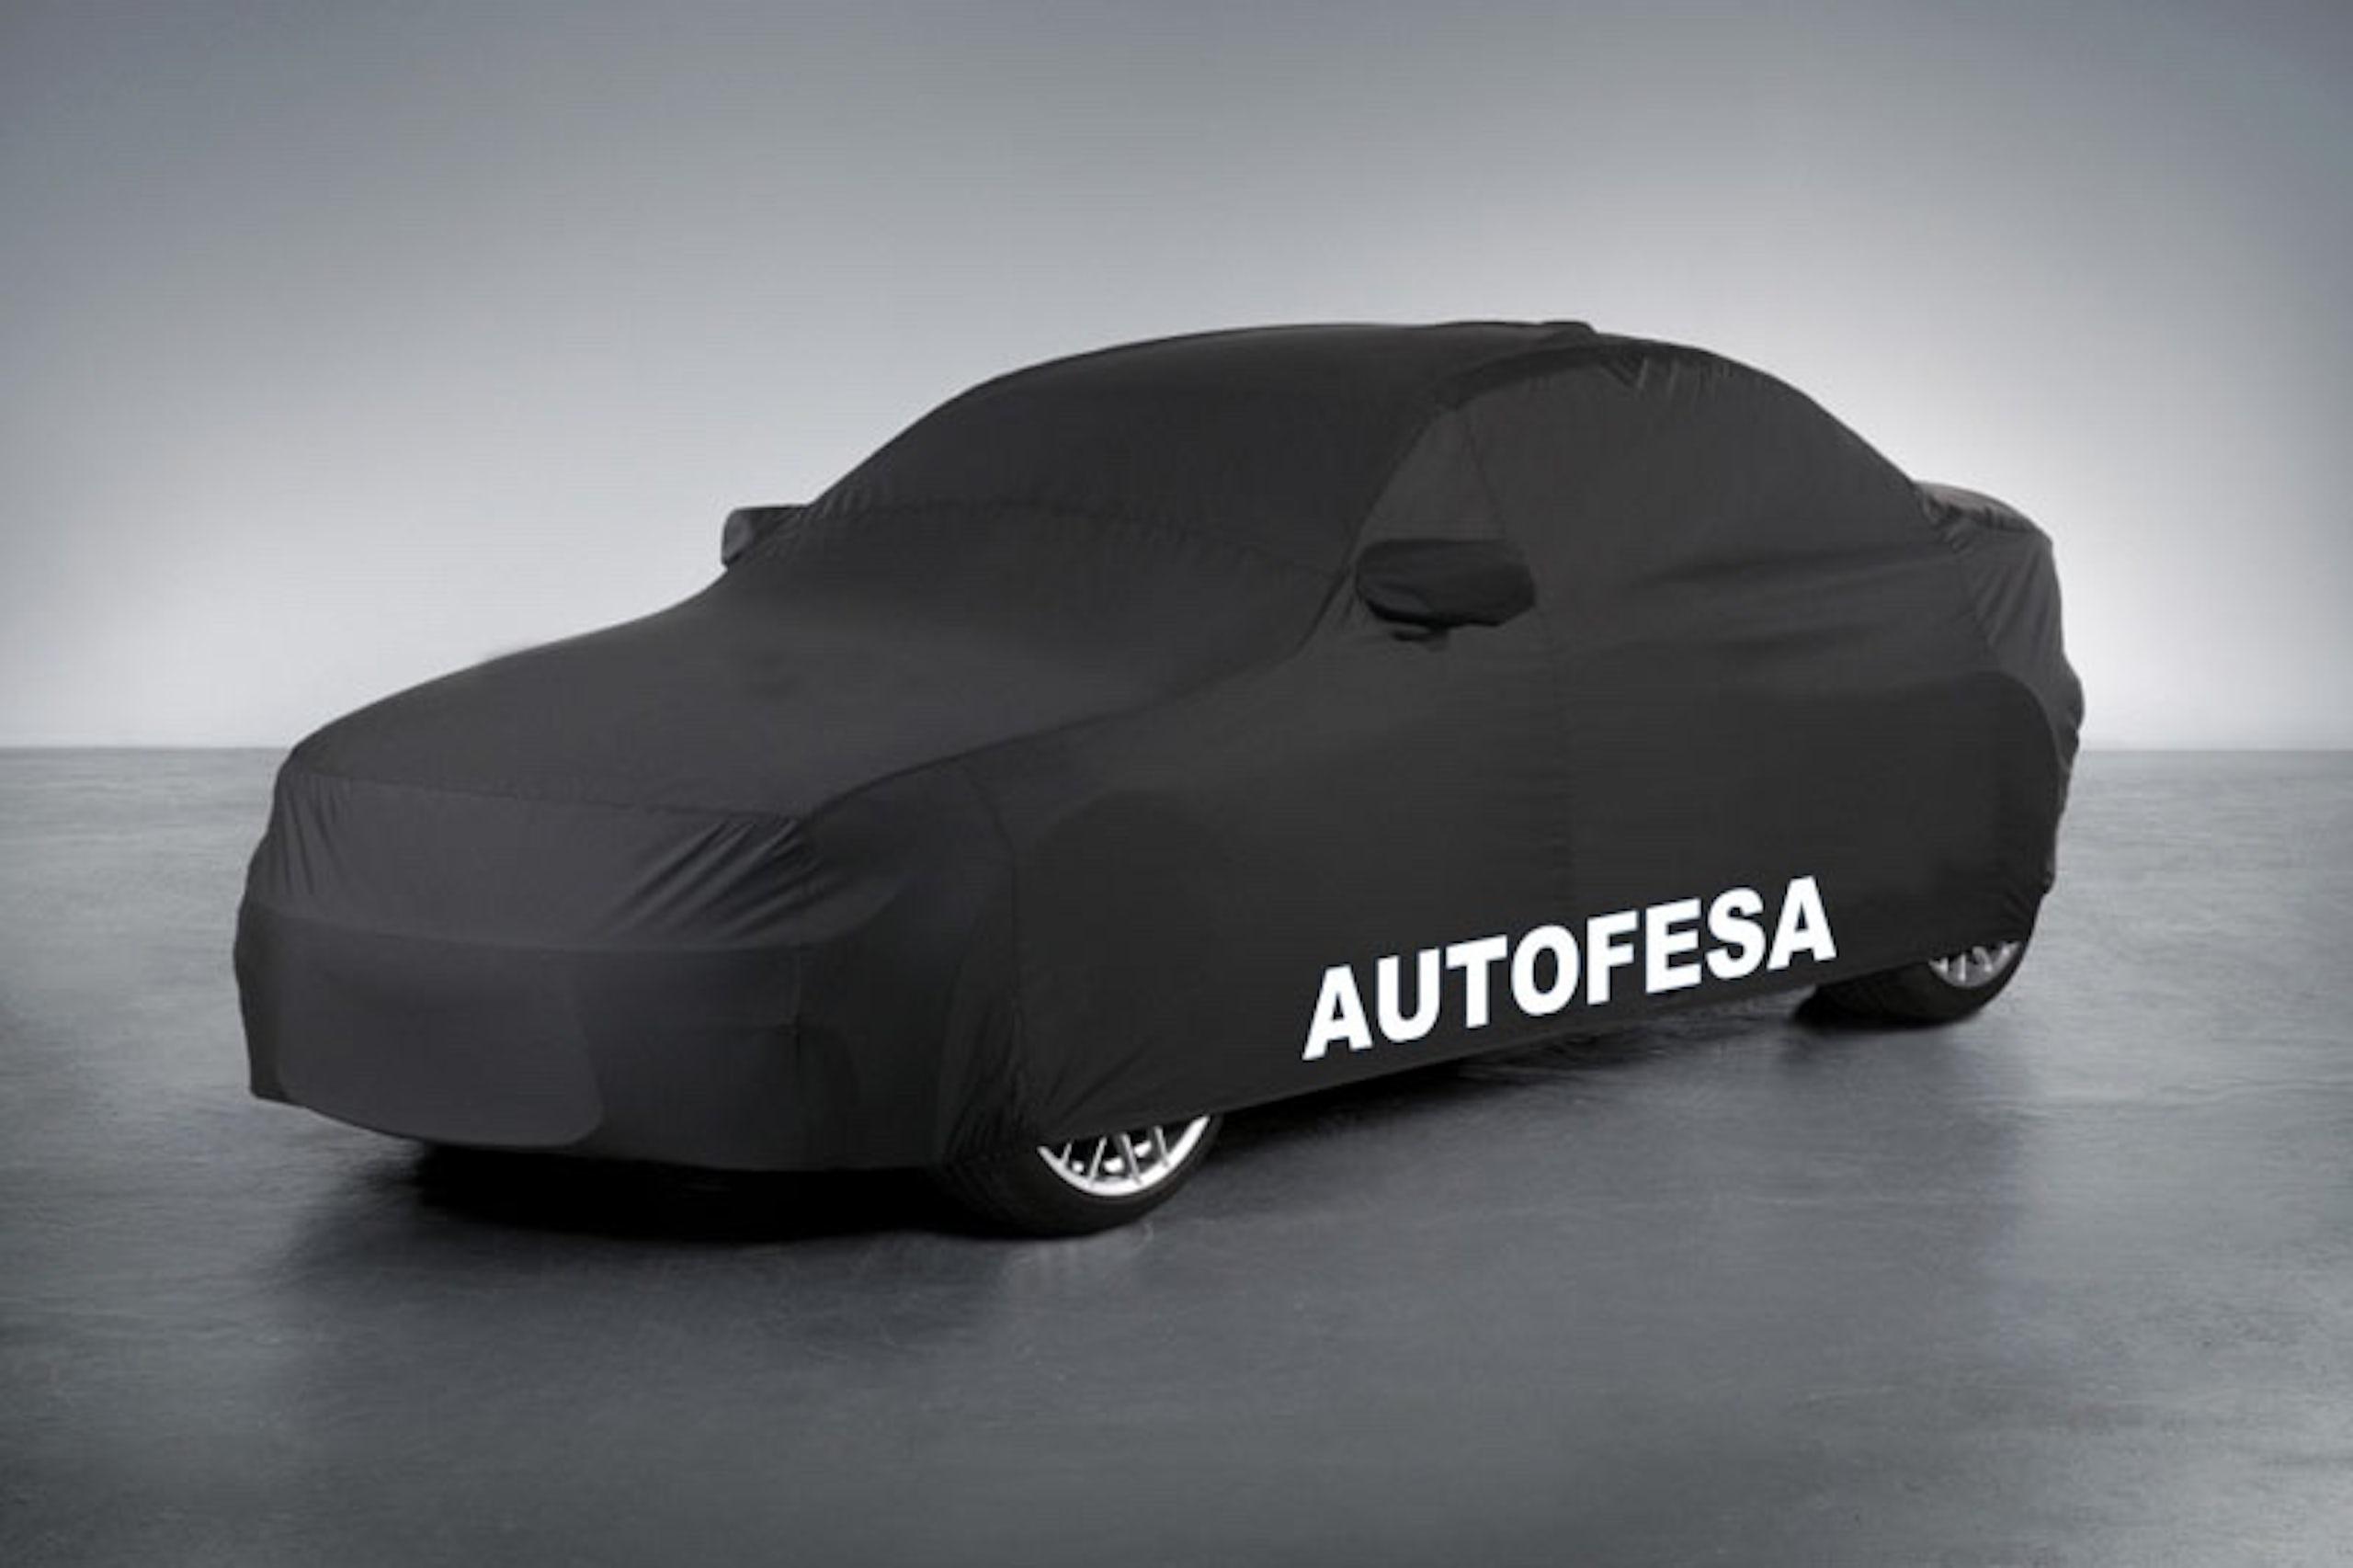 Mitsubishi Outlander 2.0 DI-D 150cv Motion 2WD 5p 7plz Auto S/S - Foto 26